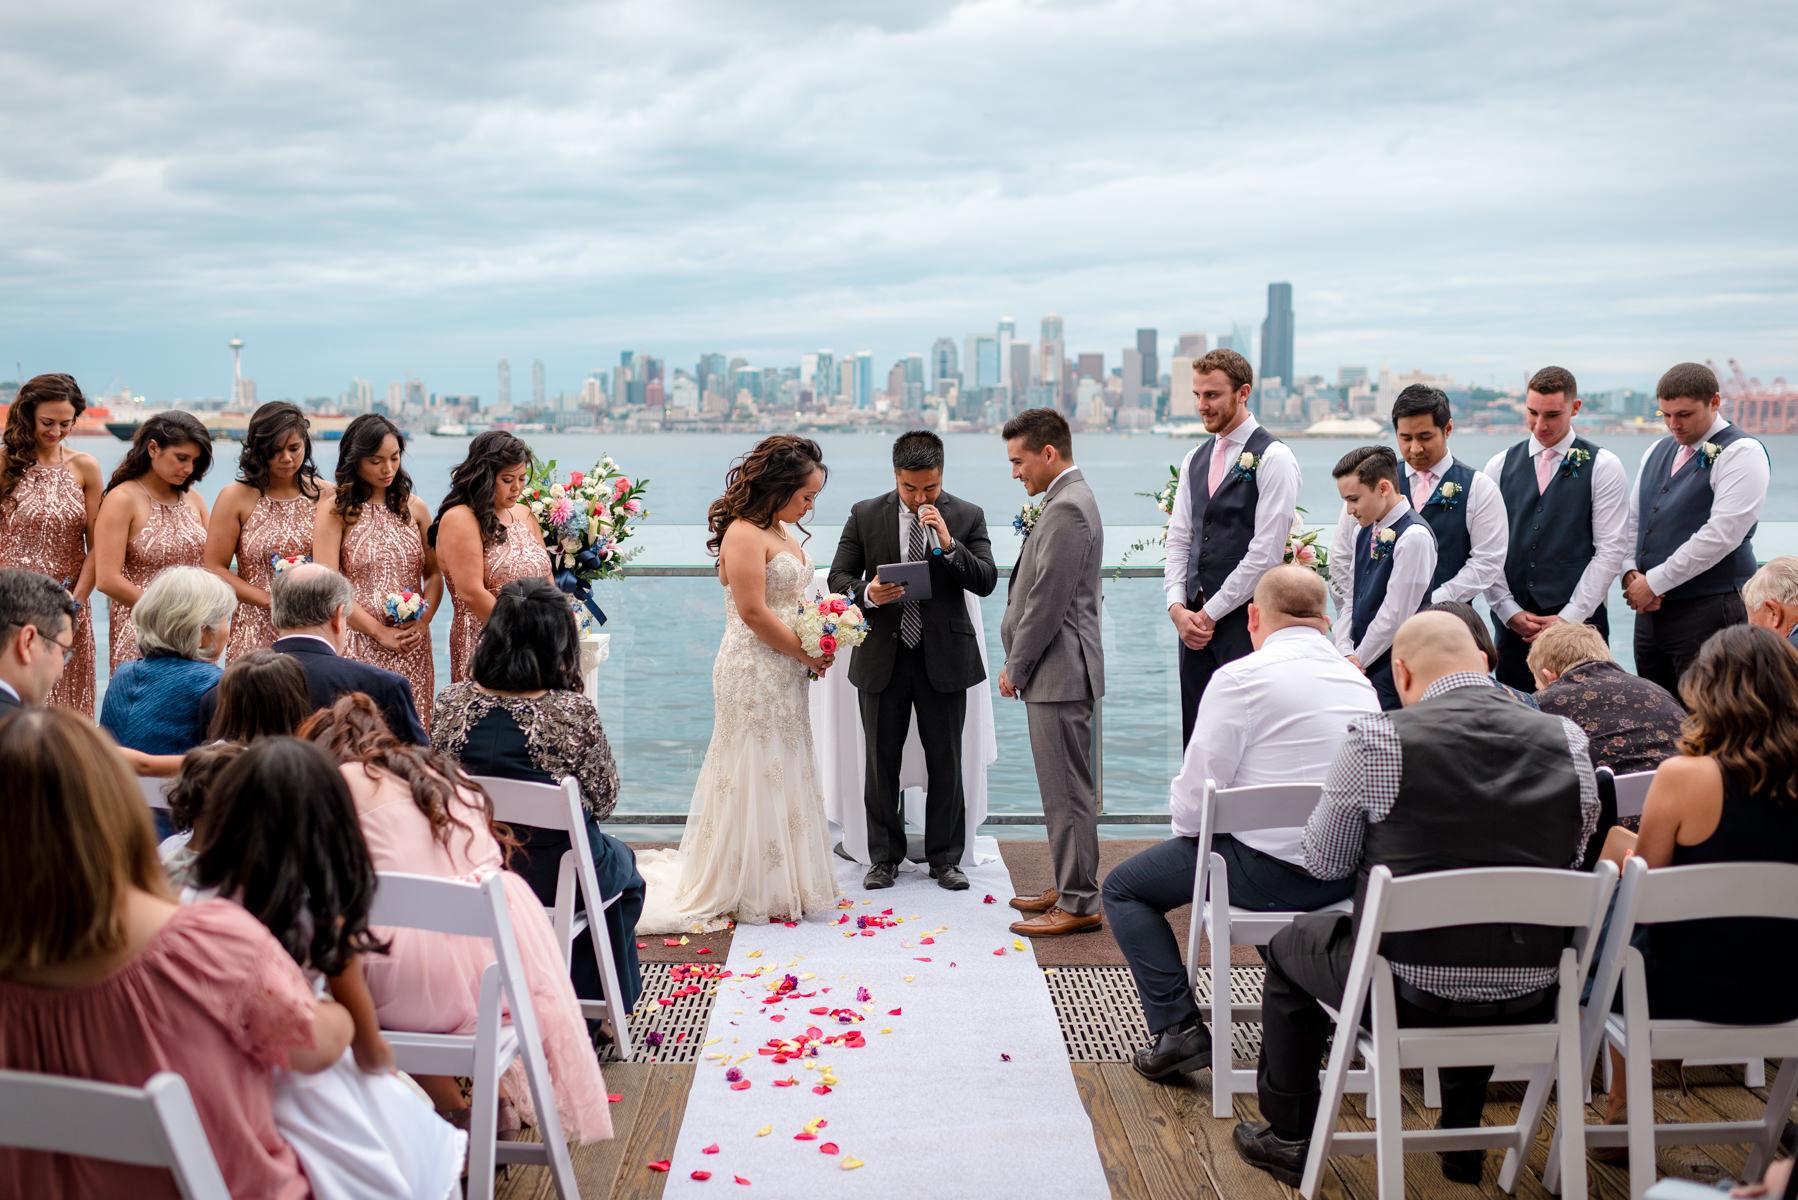 Andrew Tat - Documentary Wedding Photography - Salty's - Seattle, Washington -Mark & Marcy - 11.jpg